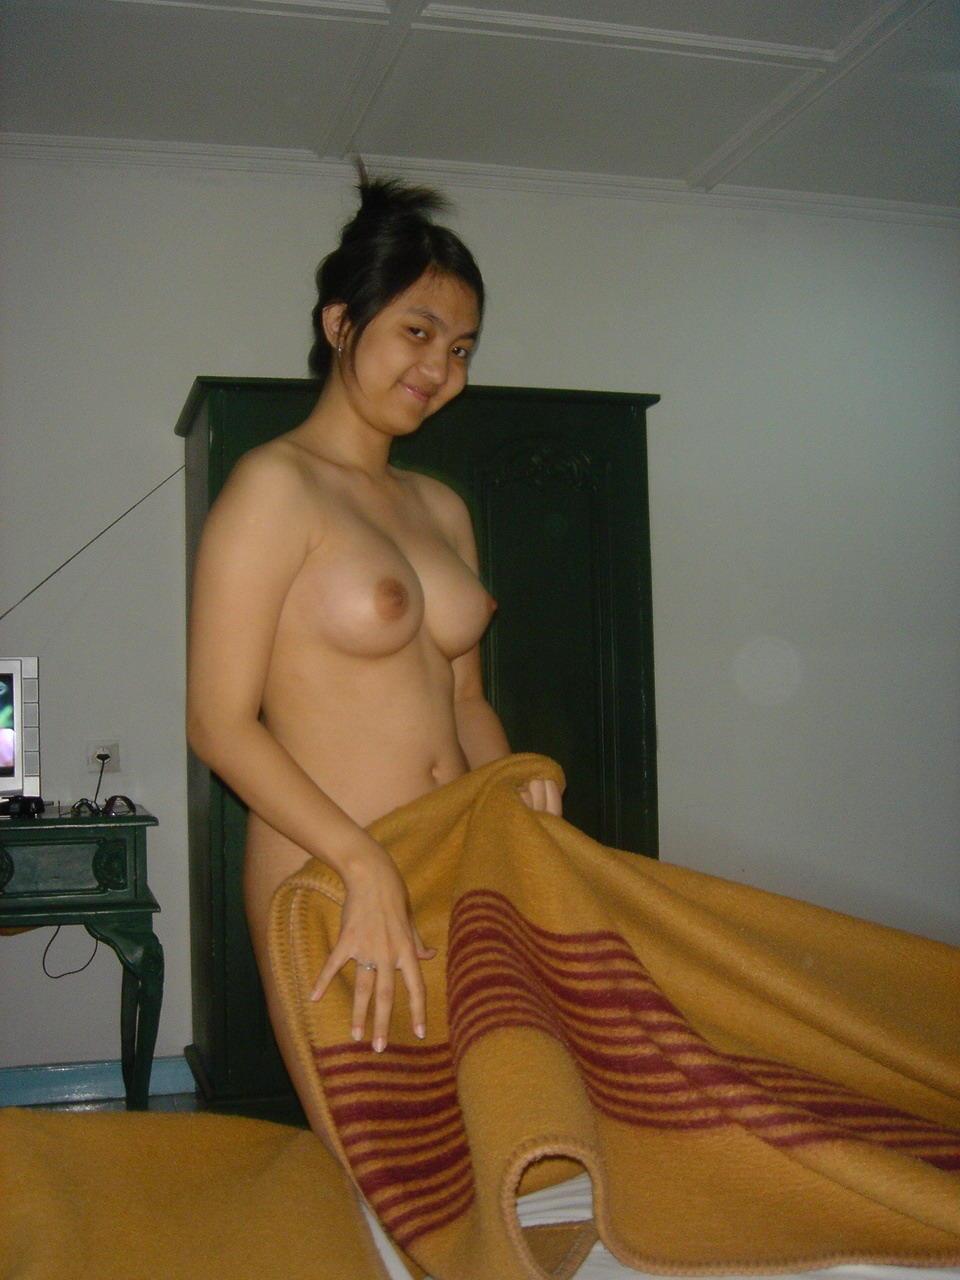 nude young girlbutt cheeks